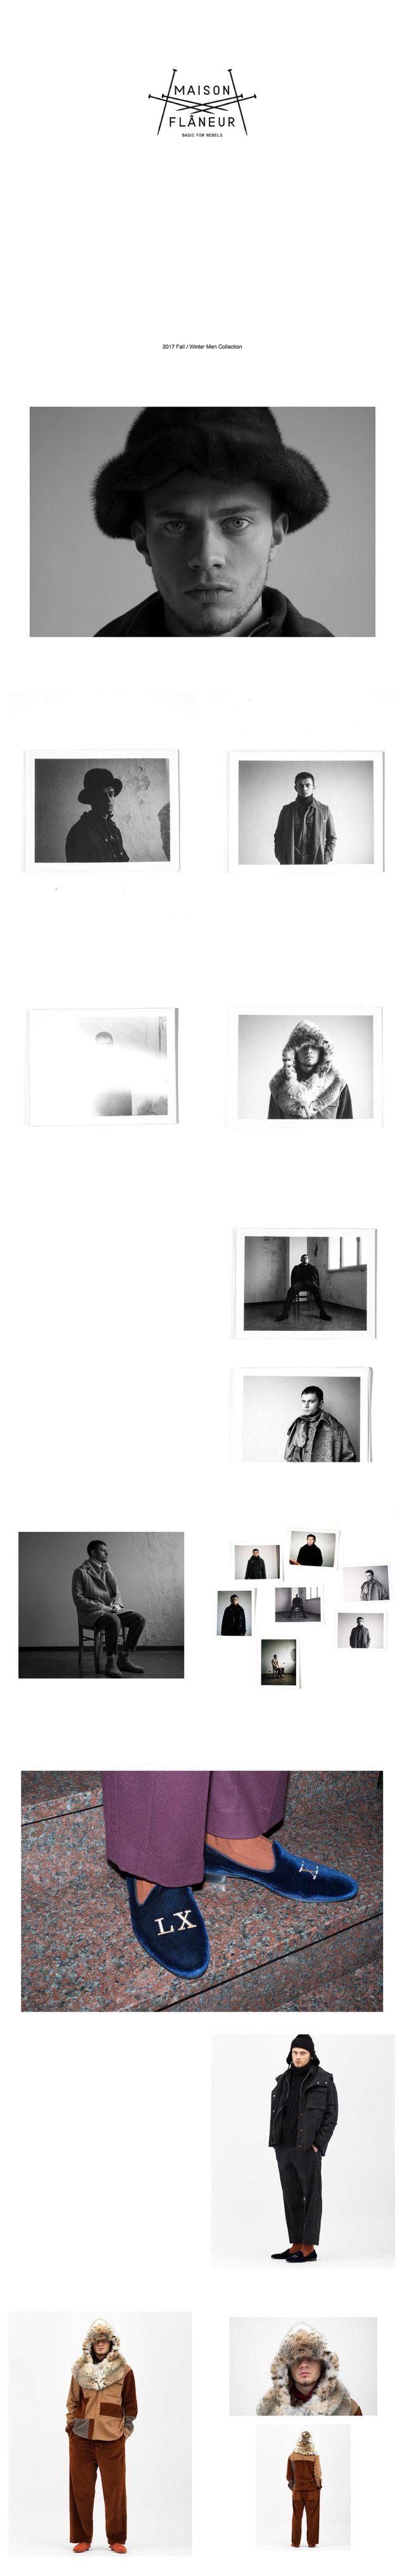 maison flaneur lookbook, 1ldk, 원엘디케이, 1ldk seoul, 원엘디케이 서울, 편집샵, 압구정 편집샵, 청담동 편집샵.jpg